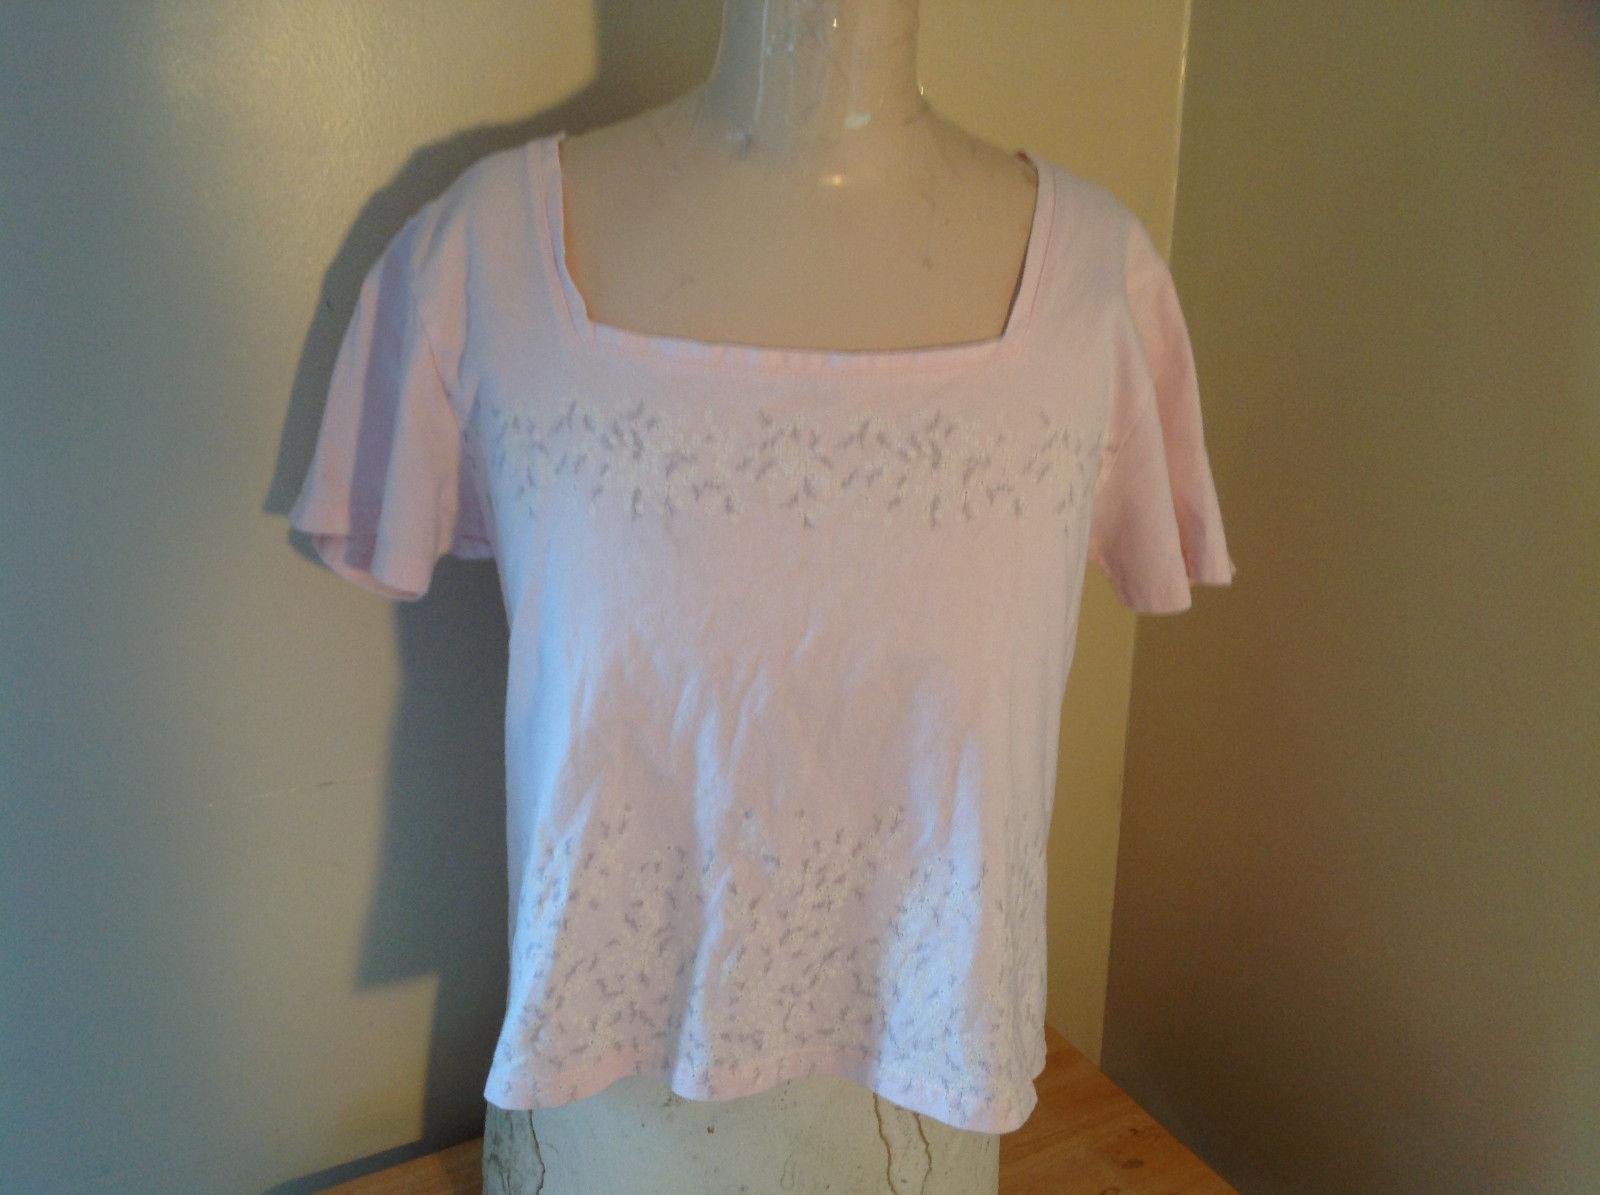 Liz Claiborne Liz Sport Pink T-Shirt with Tiny Flower Designs Bottom and Chest